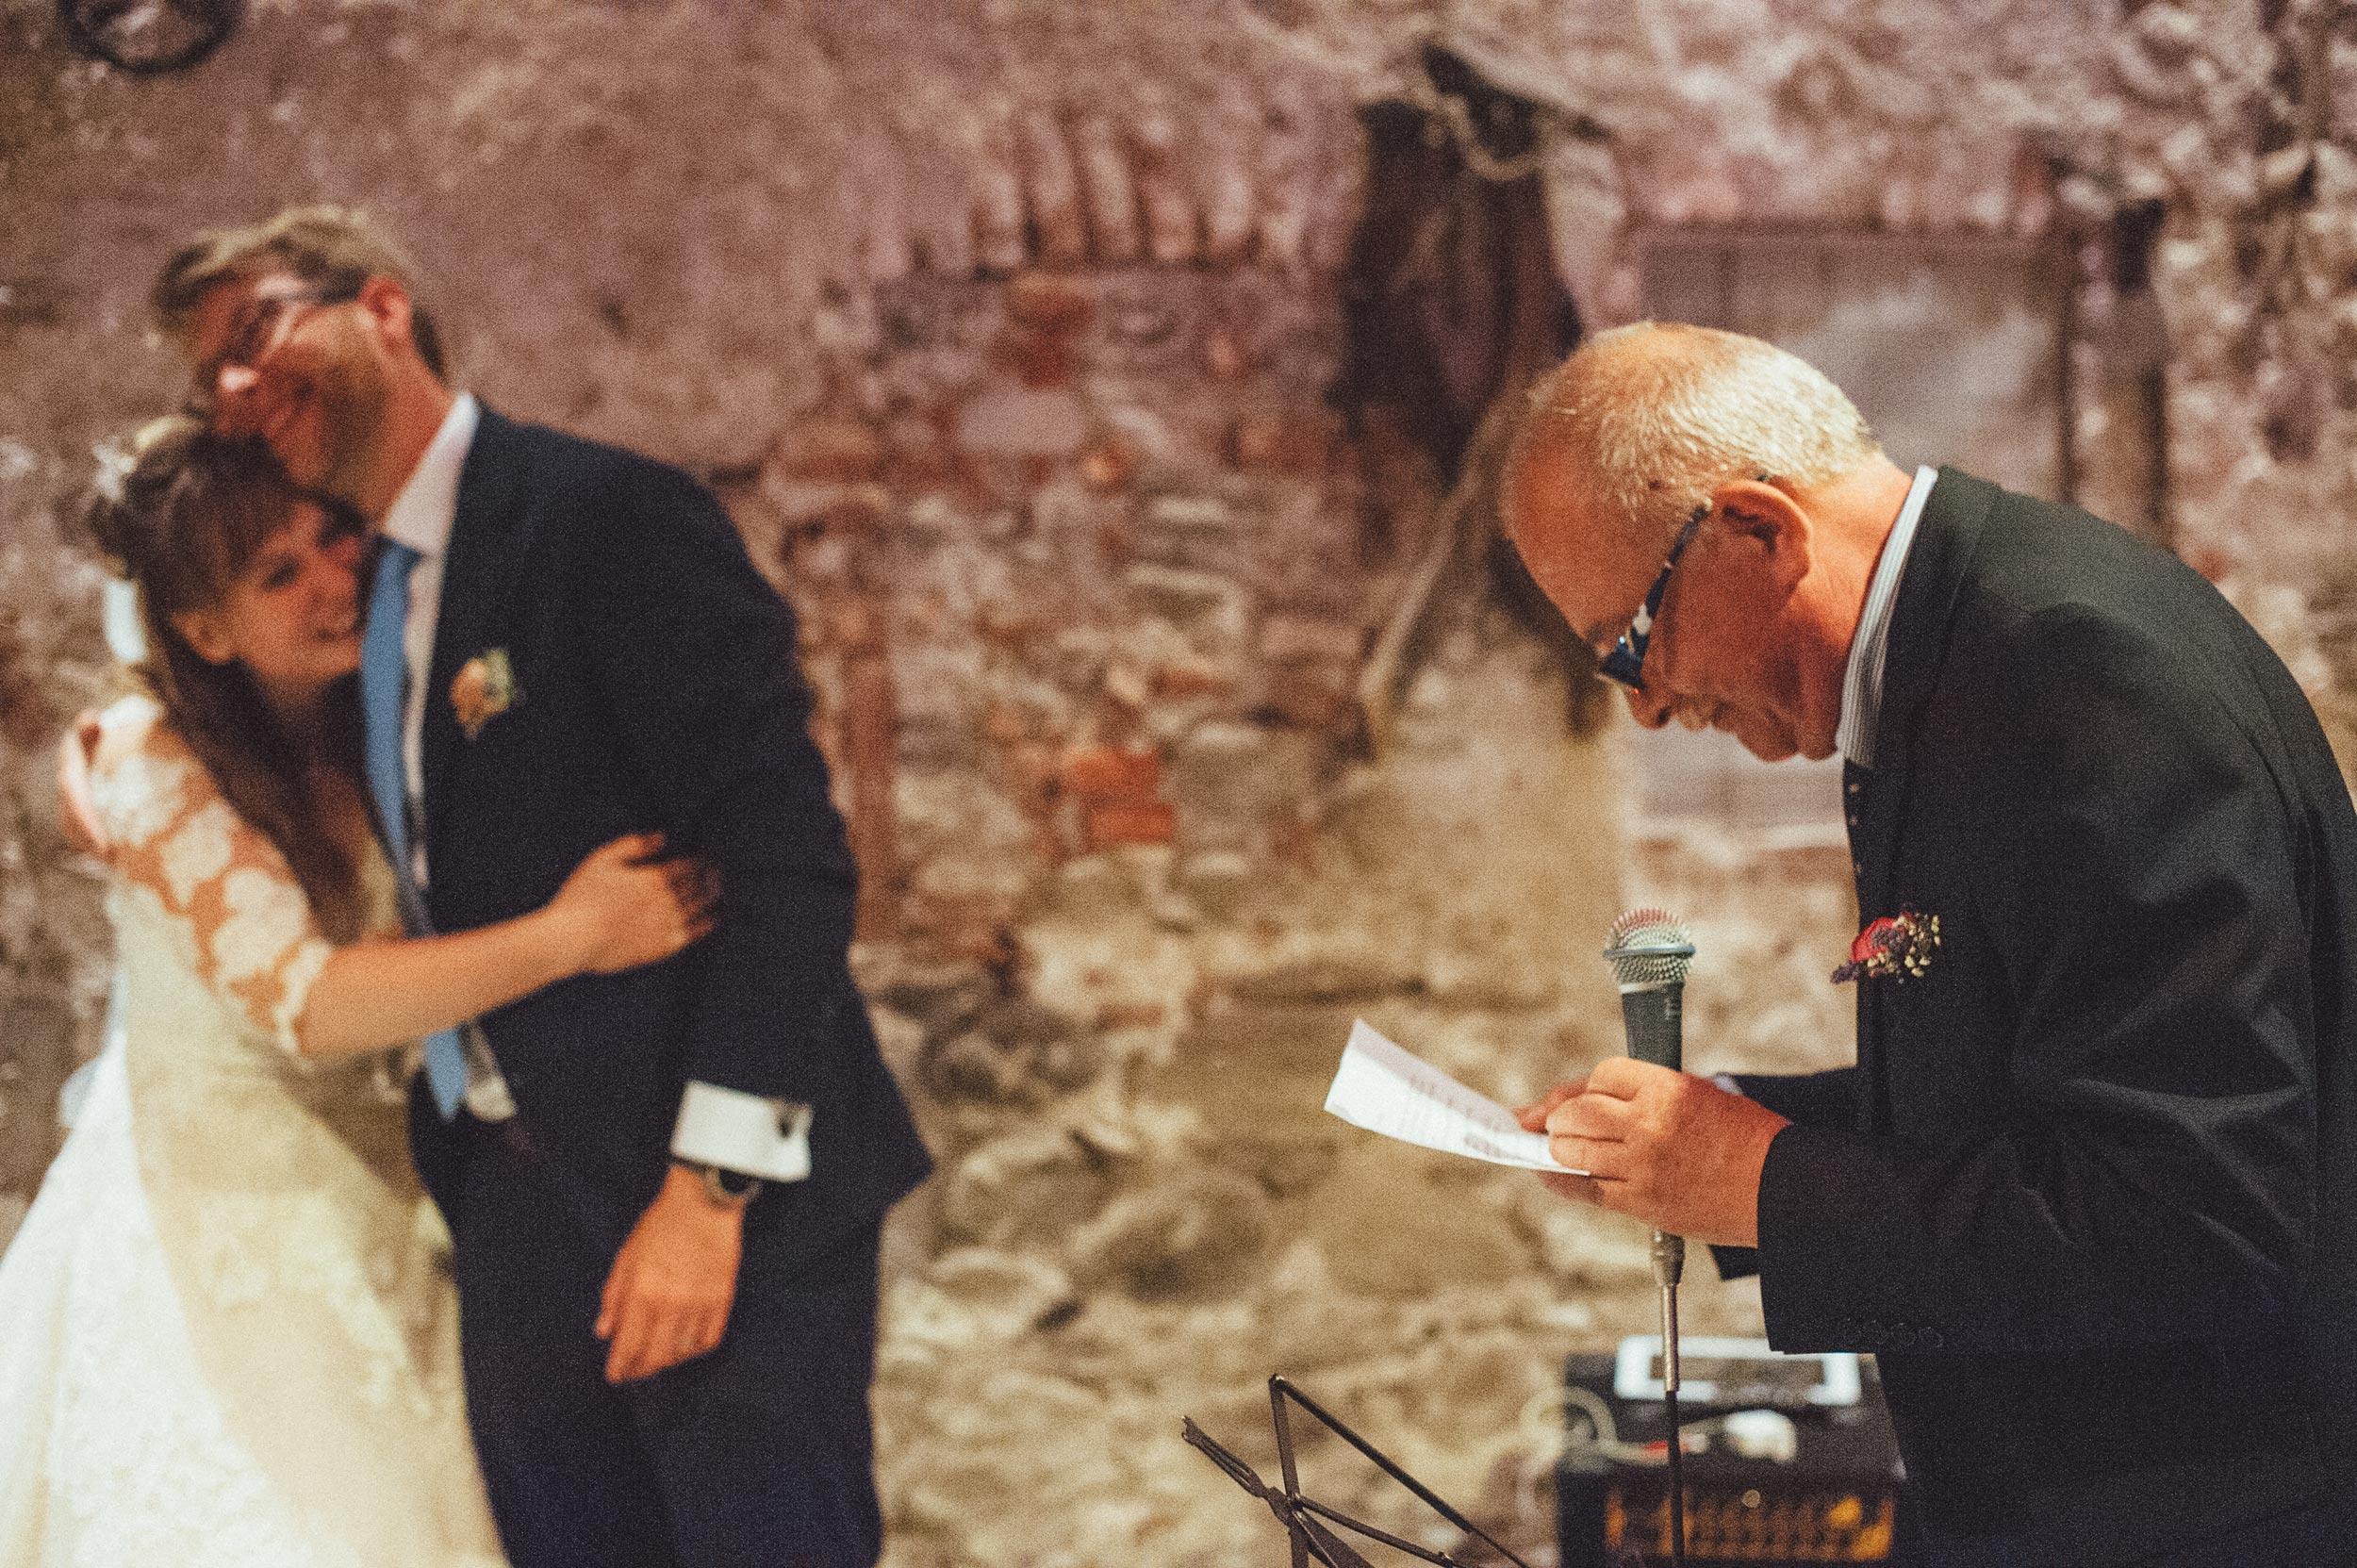 2016-Julius-Silke-Lake-Orta-Wedding-Photographer-Italy-Alessandro-Avenali-118.jpg